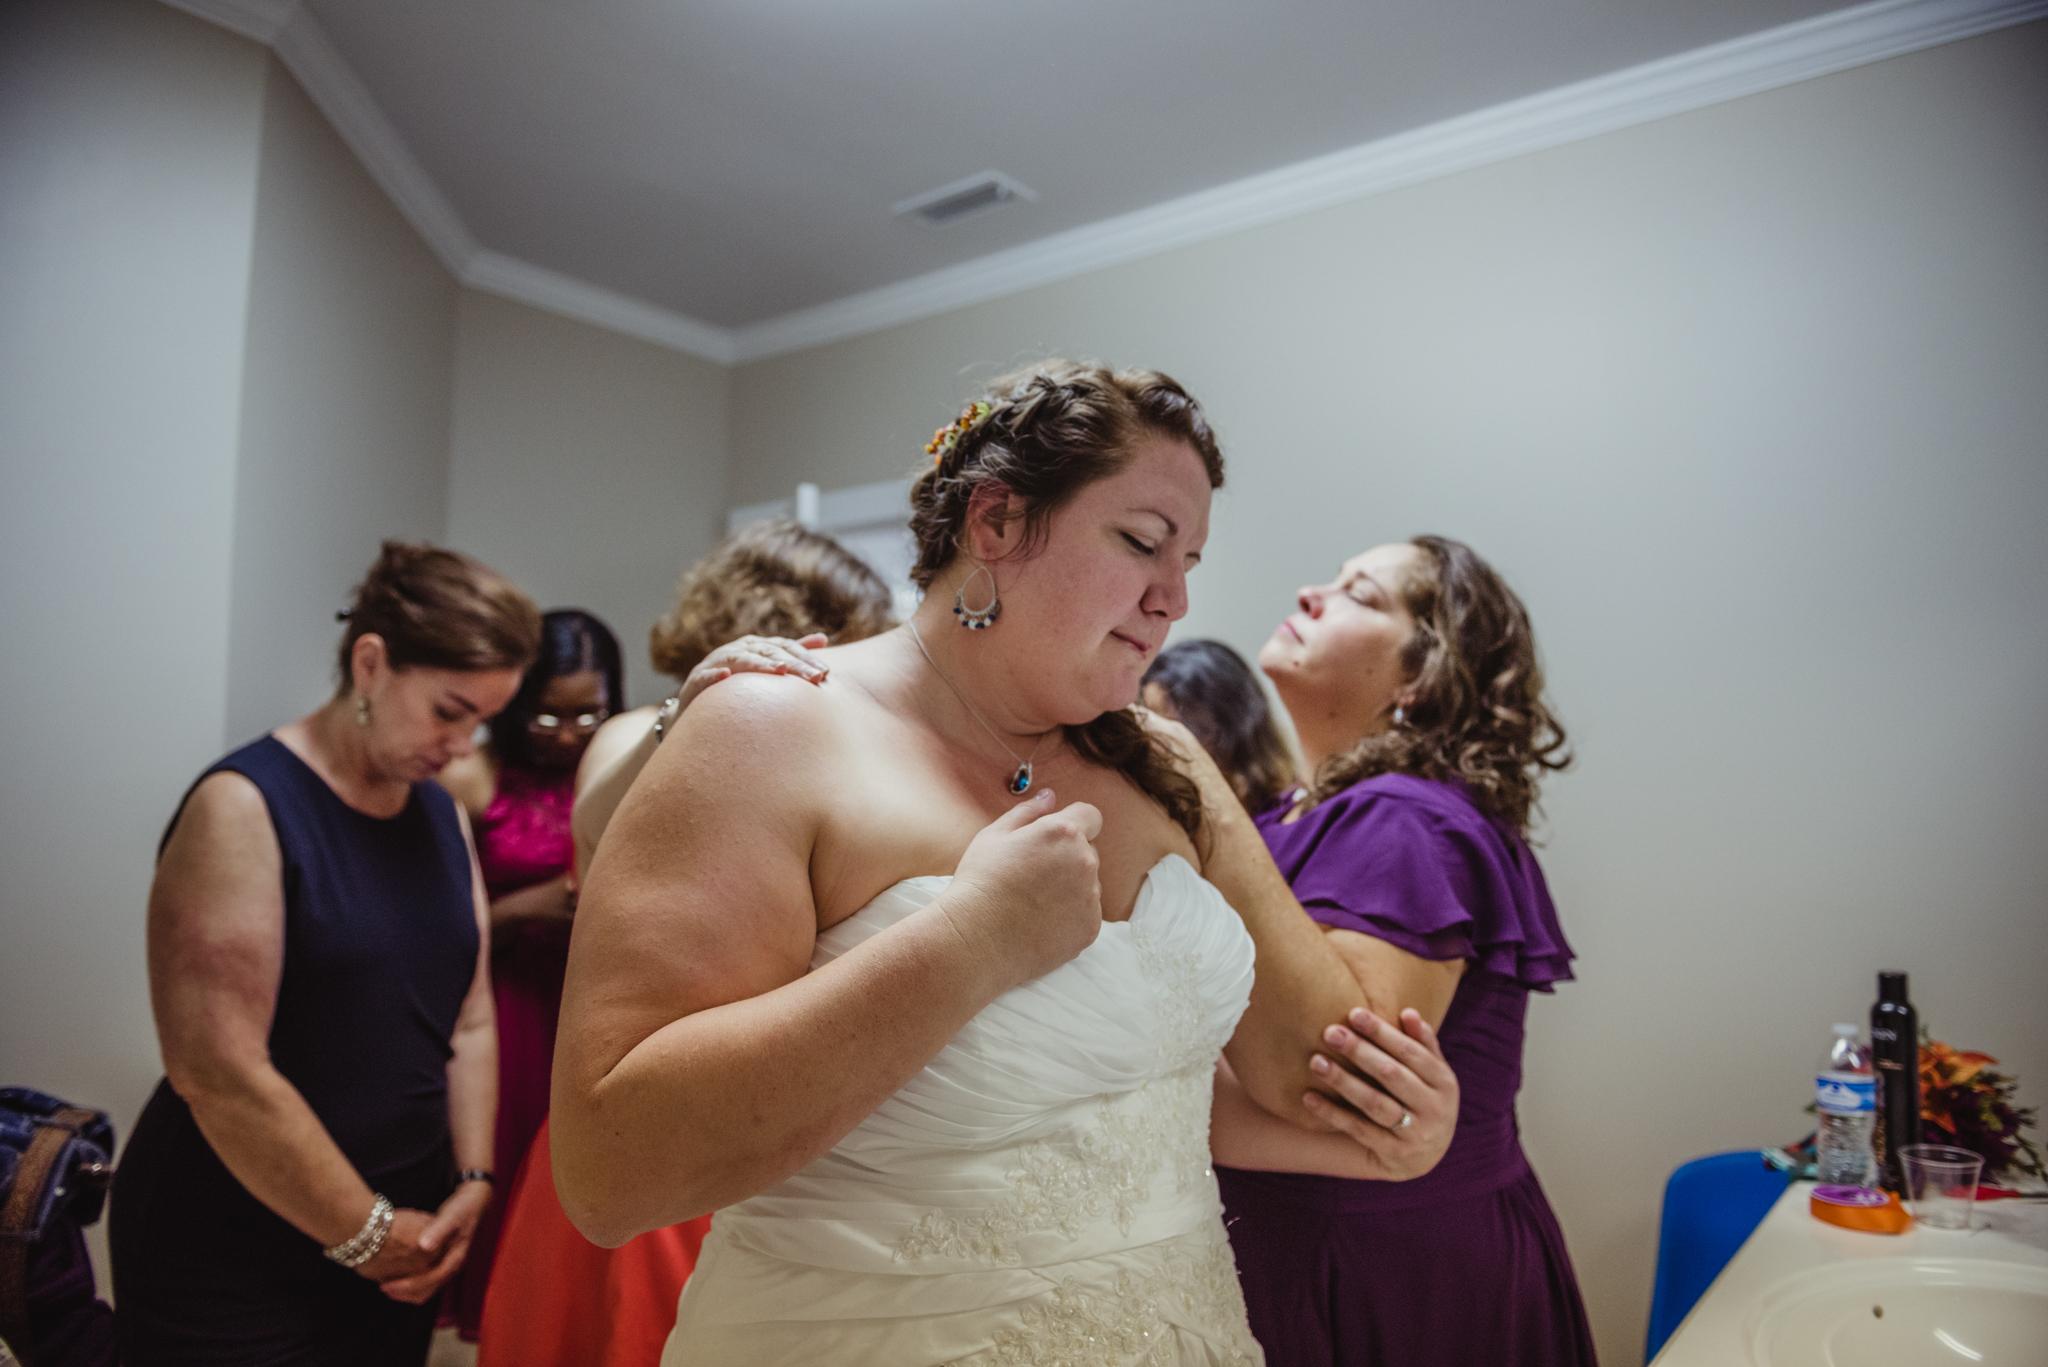 raleigh-wedding-bride-getting-ready-cd-3.jpg